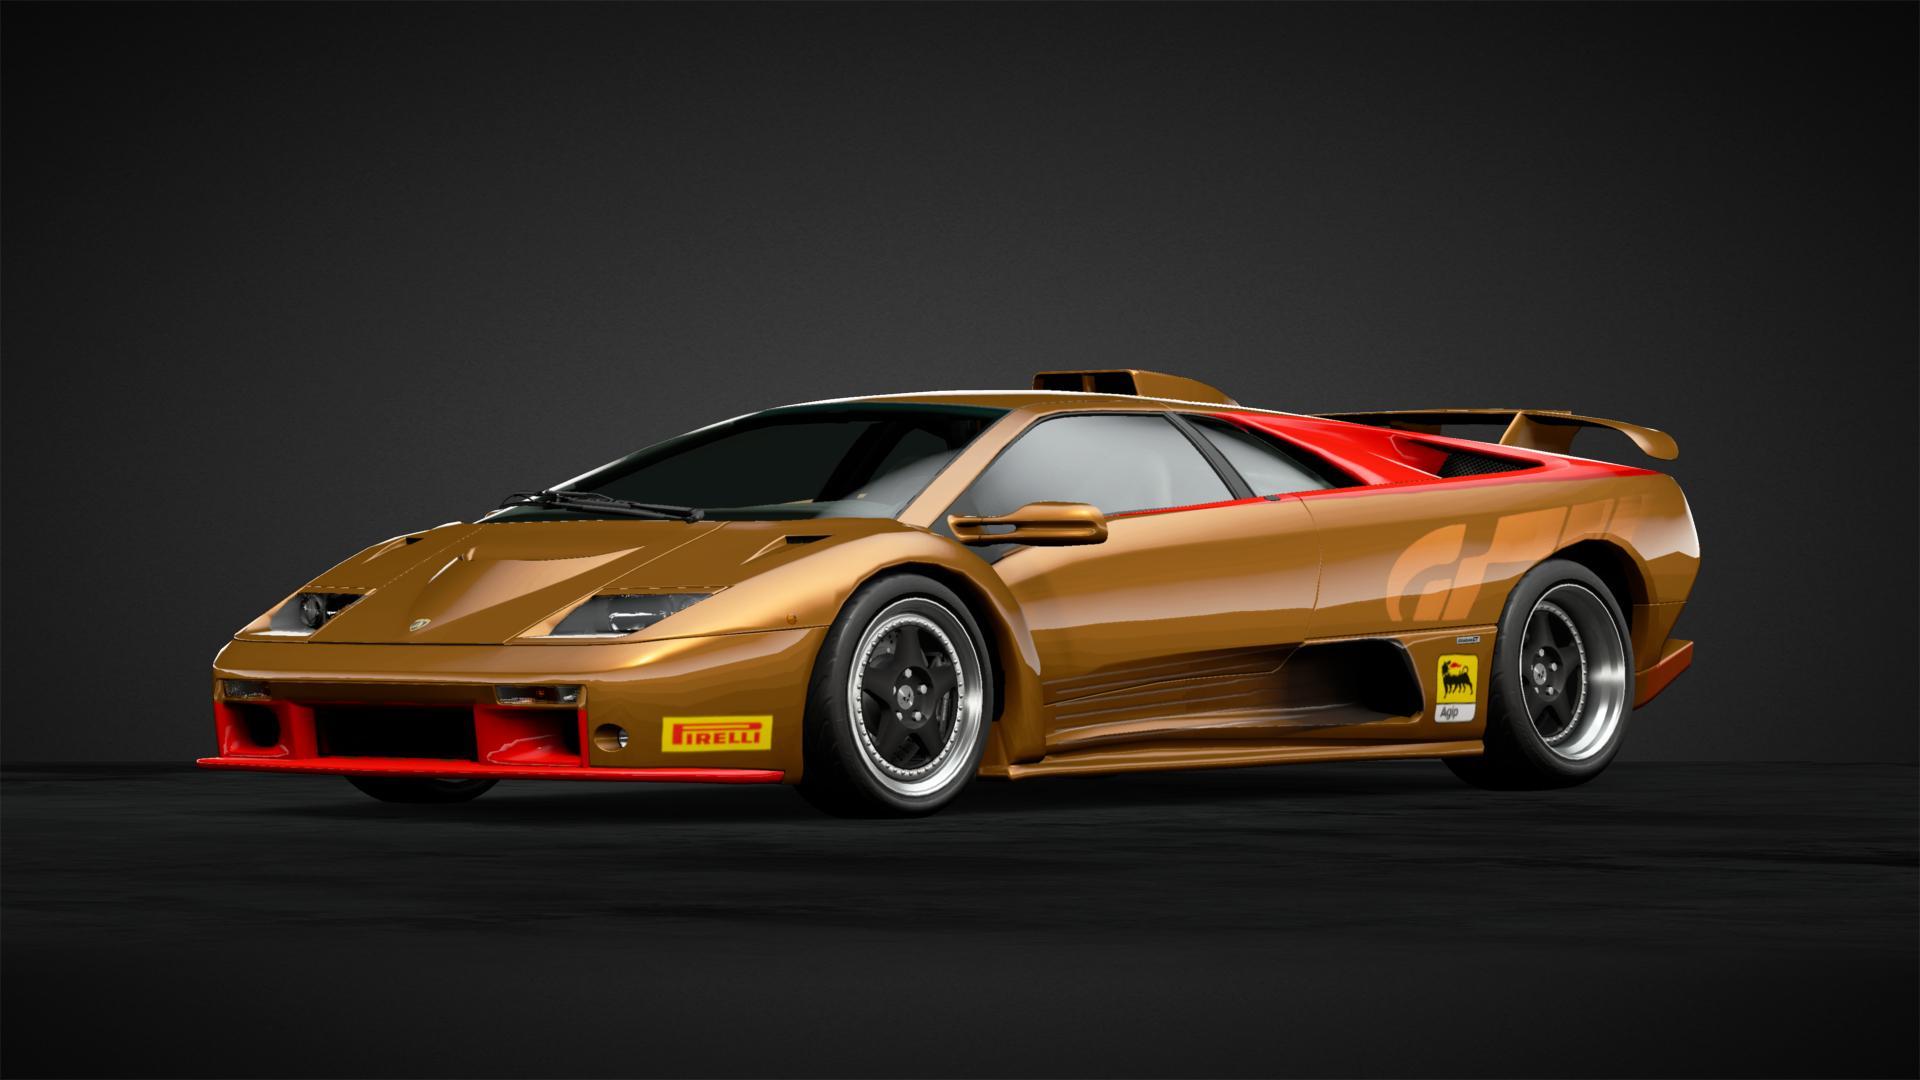 Golden Lambo Car Livery By Spyder 907 Community Gran Turismo Sport